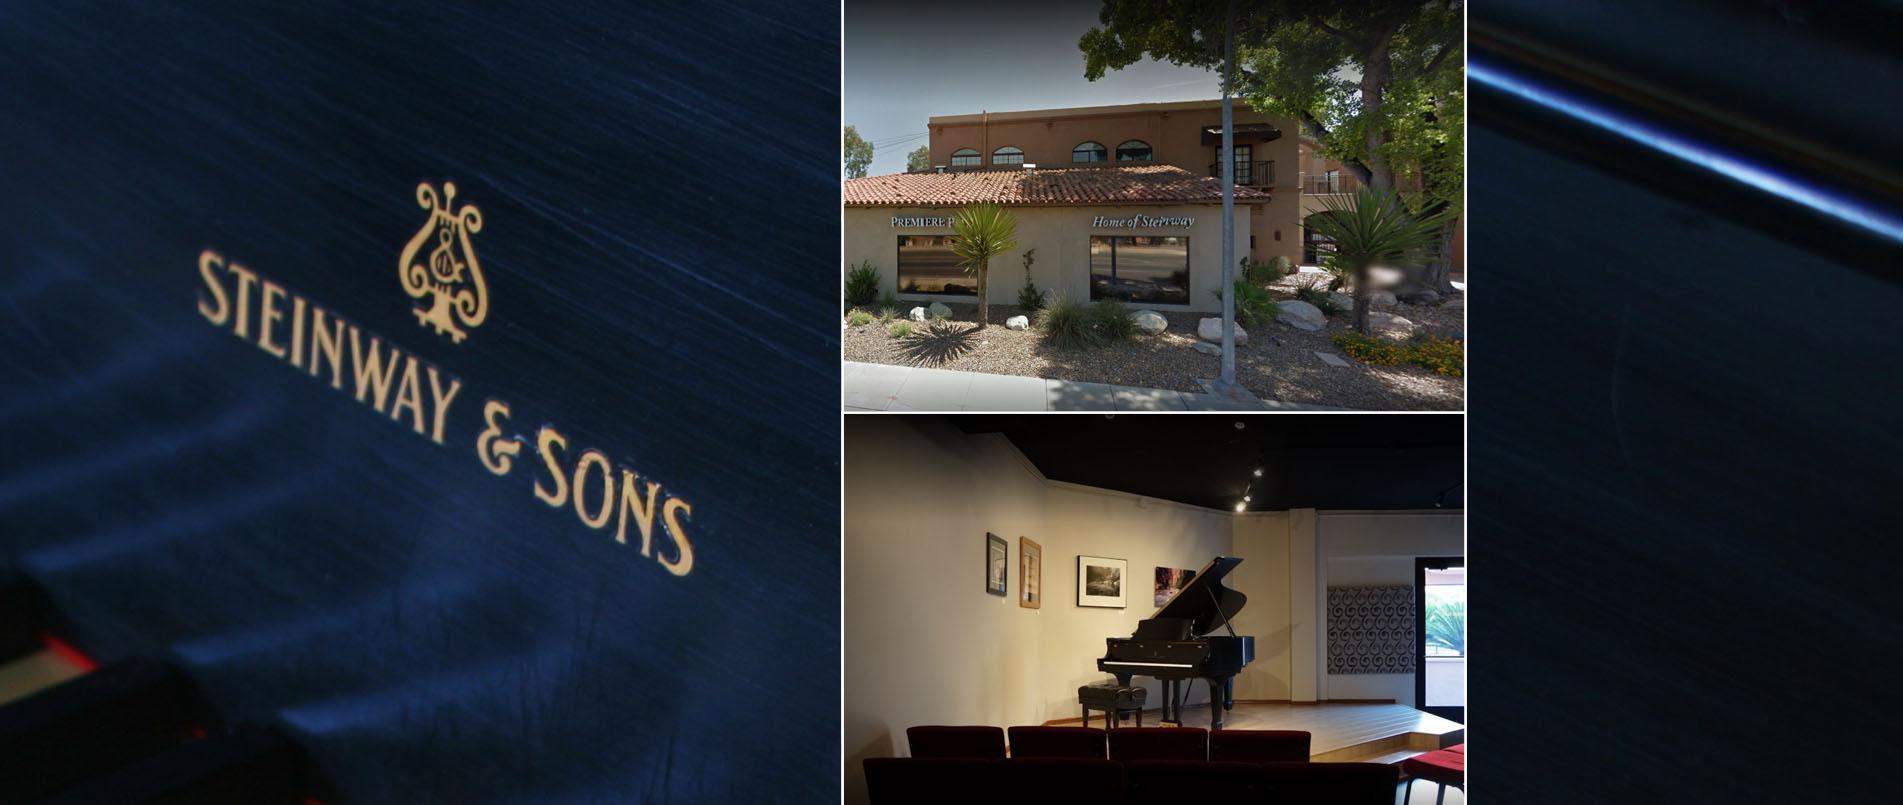 Premiere Piano - Steinway